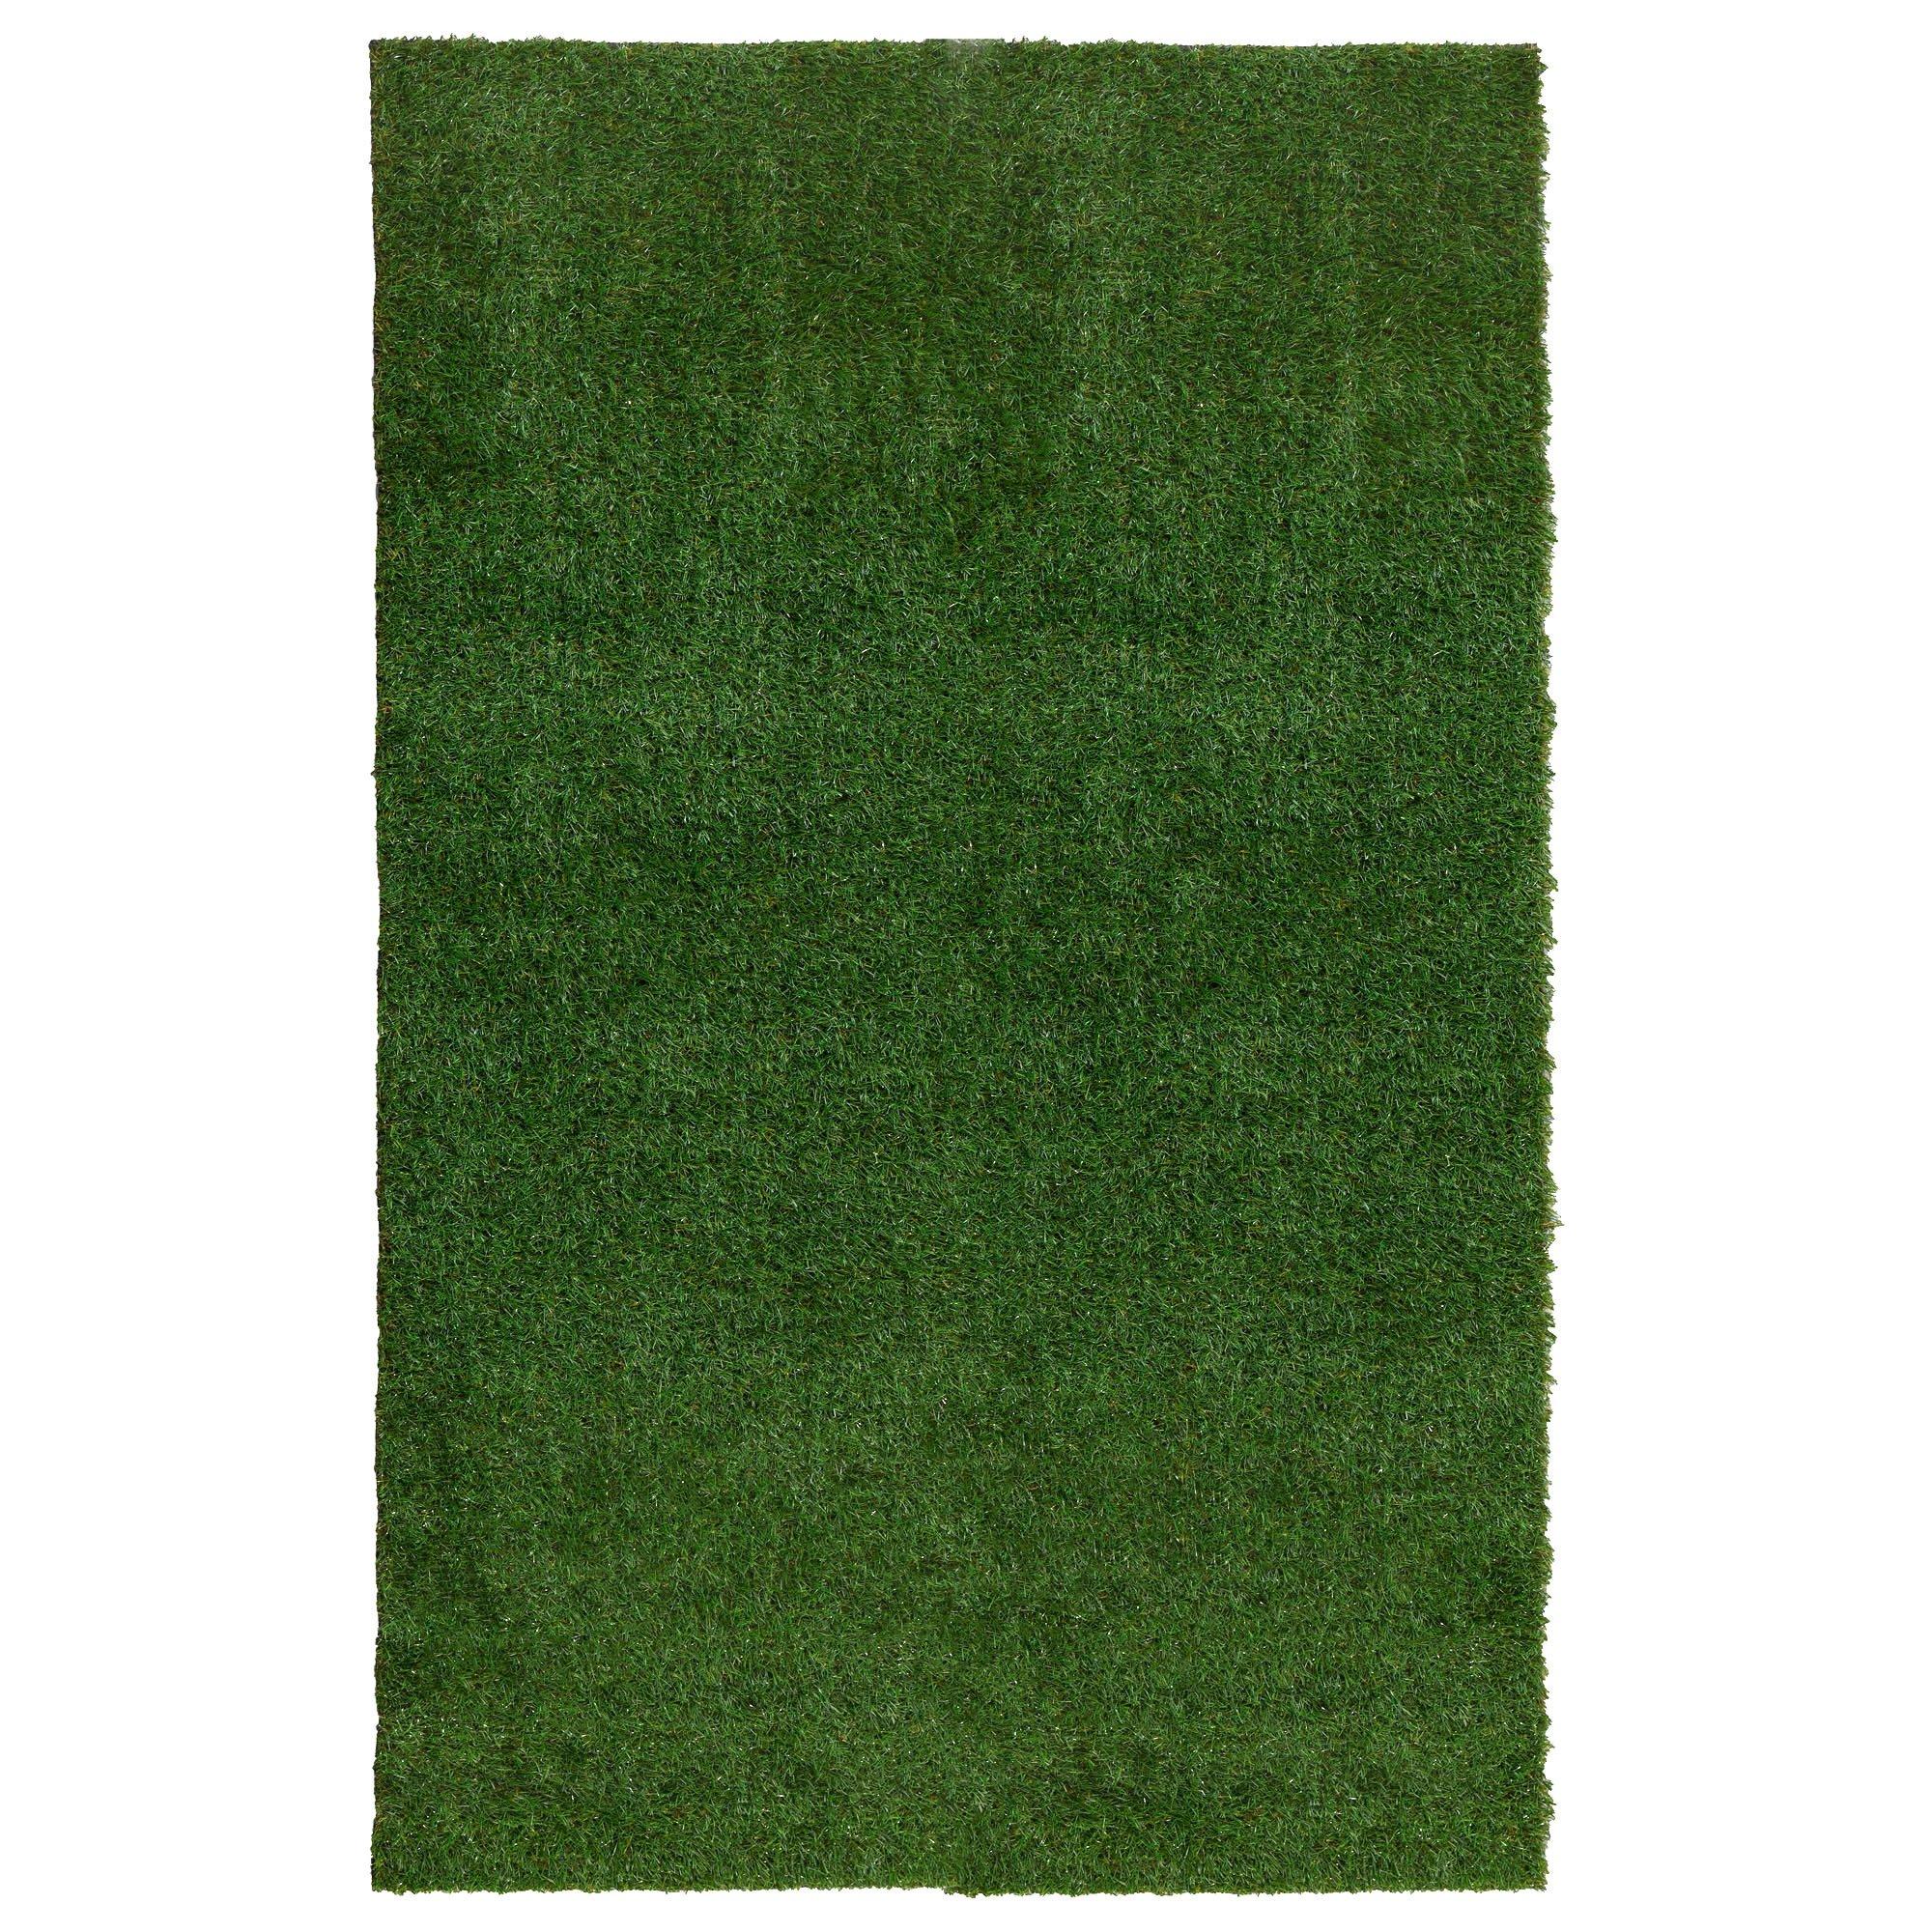 Ottomanson Garden Collection Indoor/Outdoor Artificial Solid Grass Design Area Rug X Green Turf, 6'6'' X 9'3''